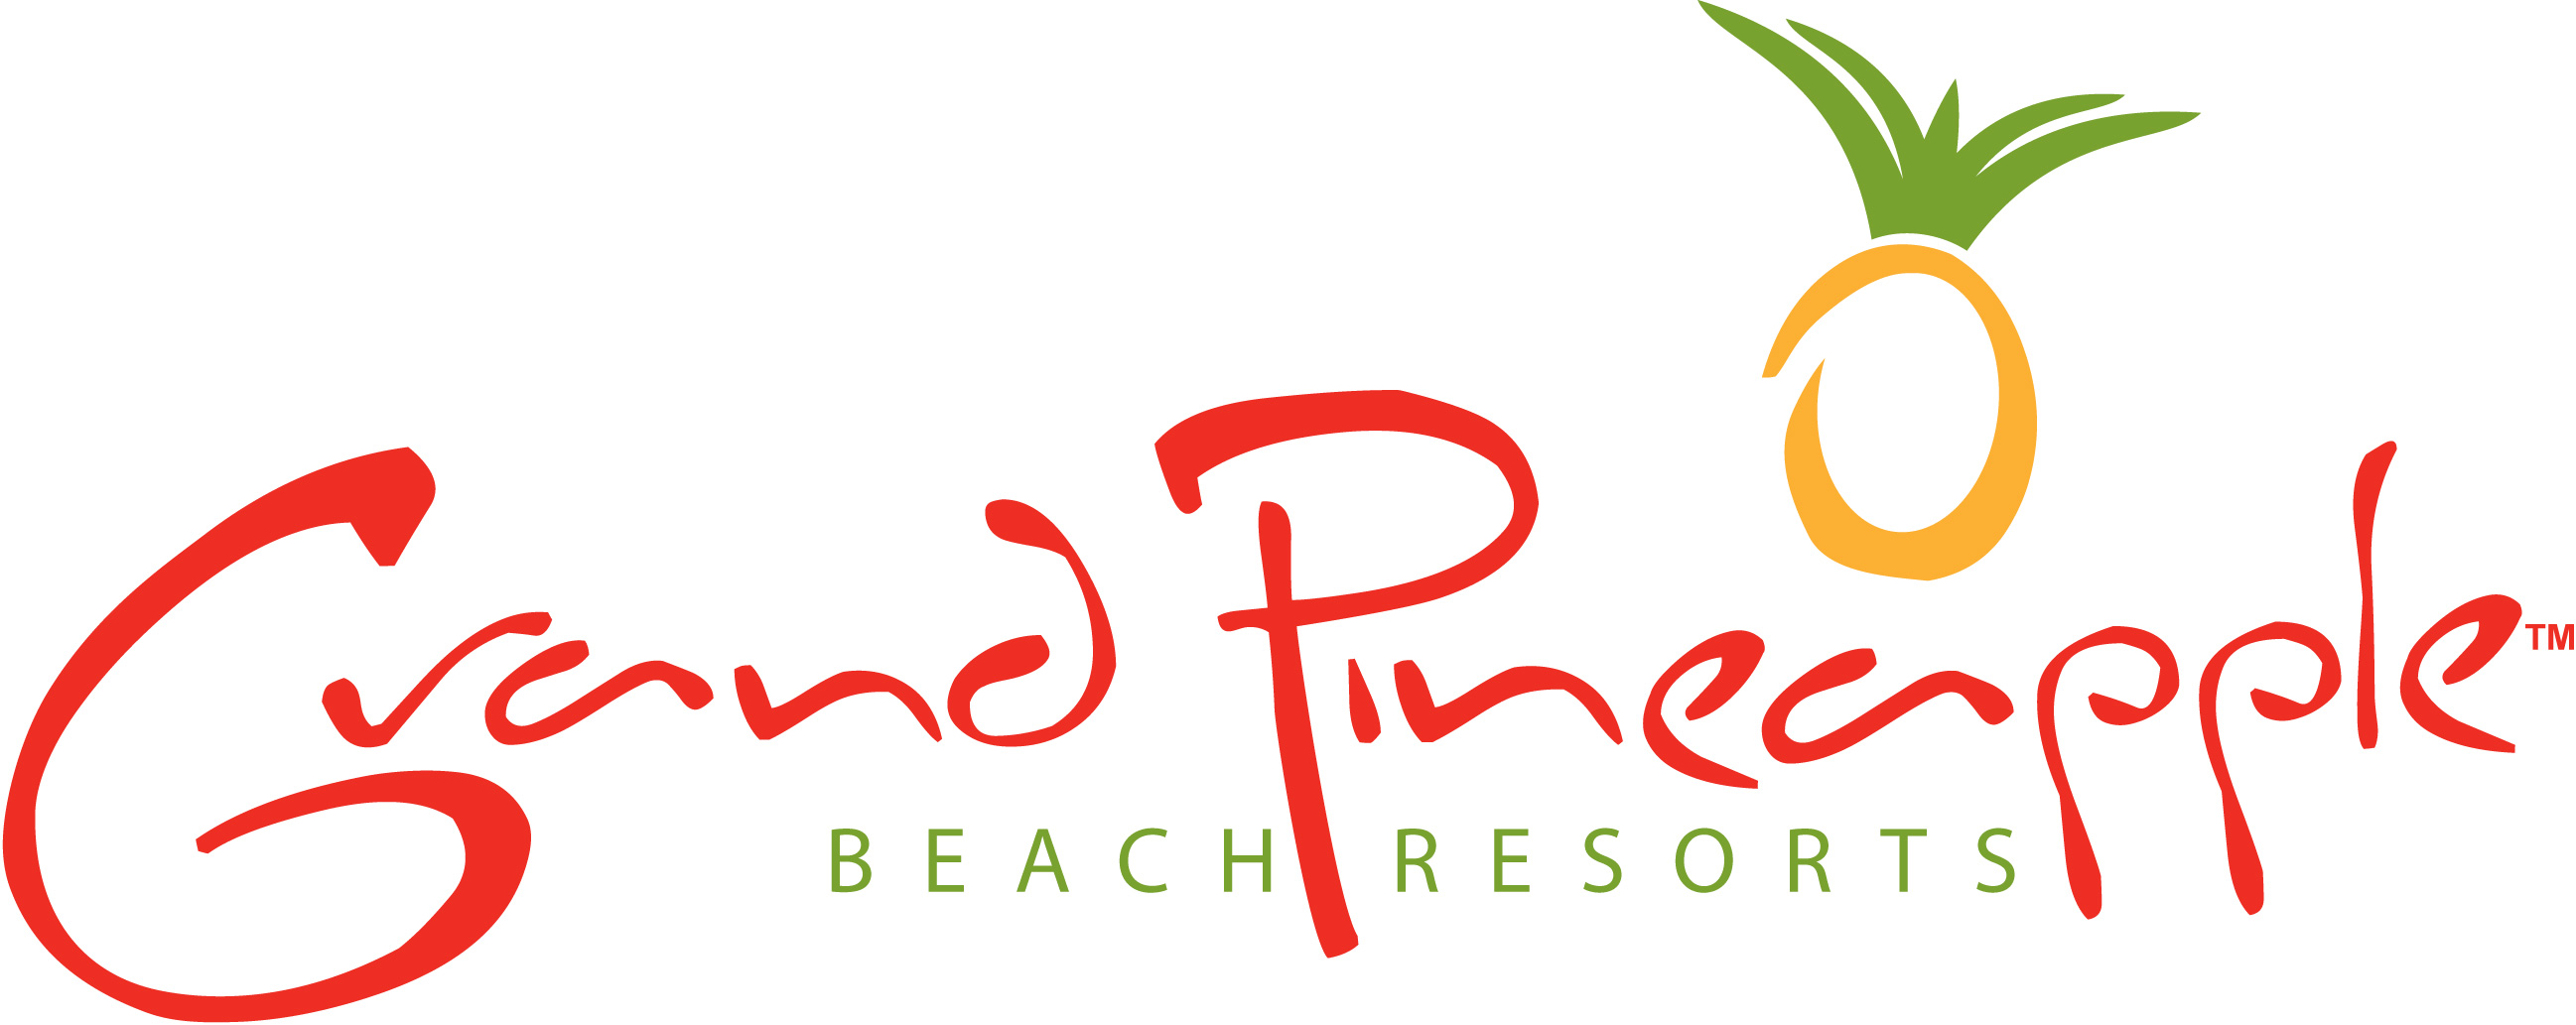 Sandals Amp Beaches Resorts Air Capital Travel